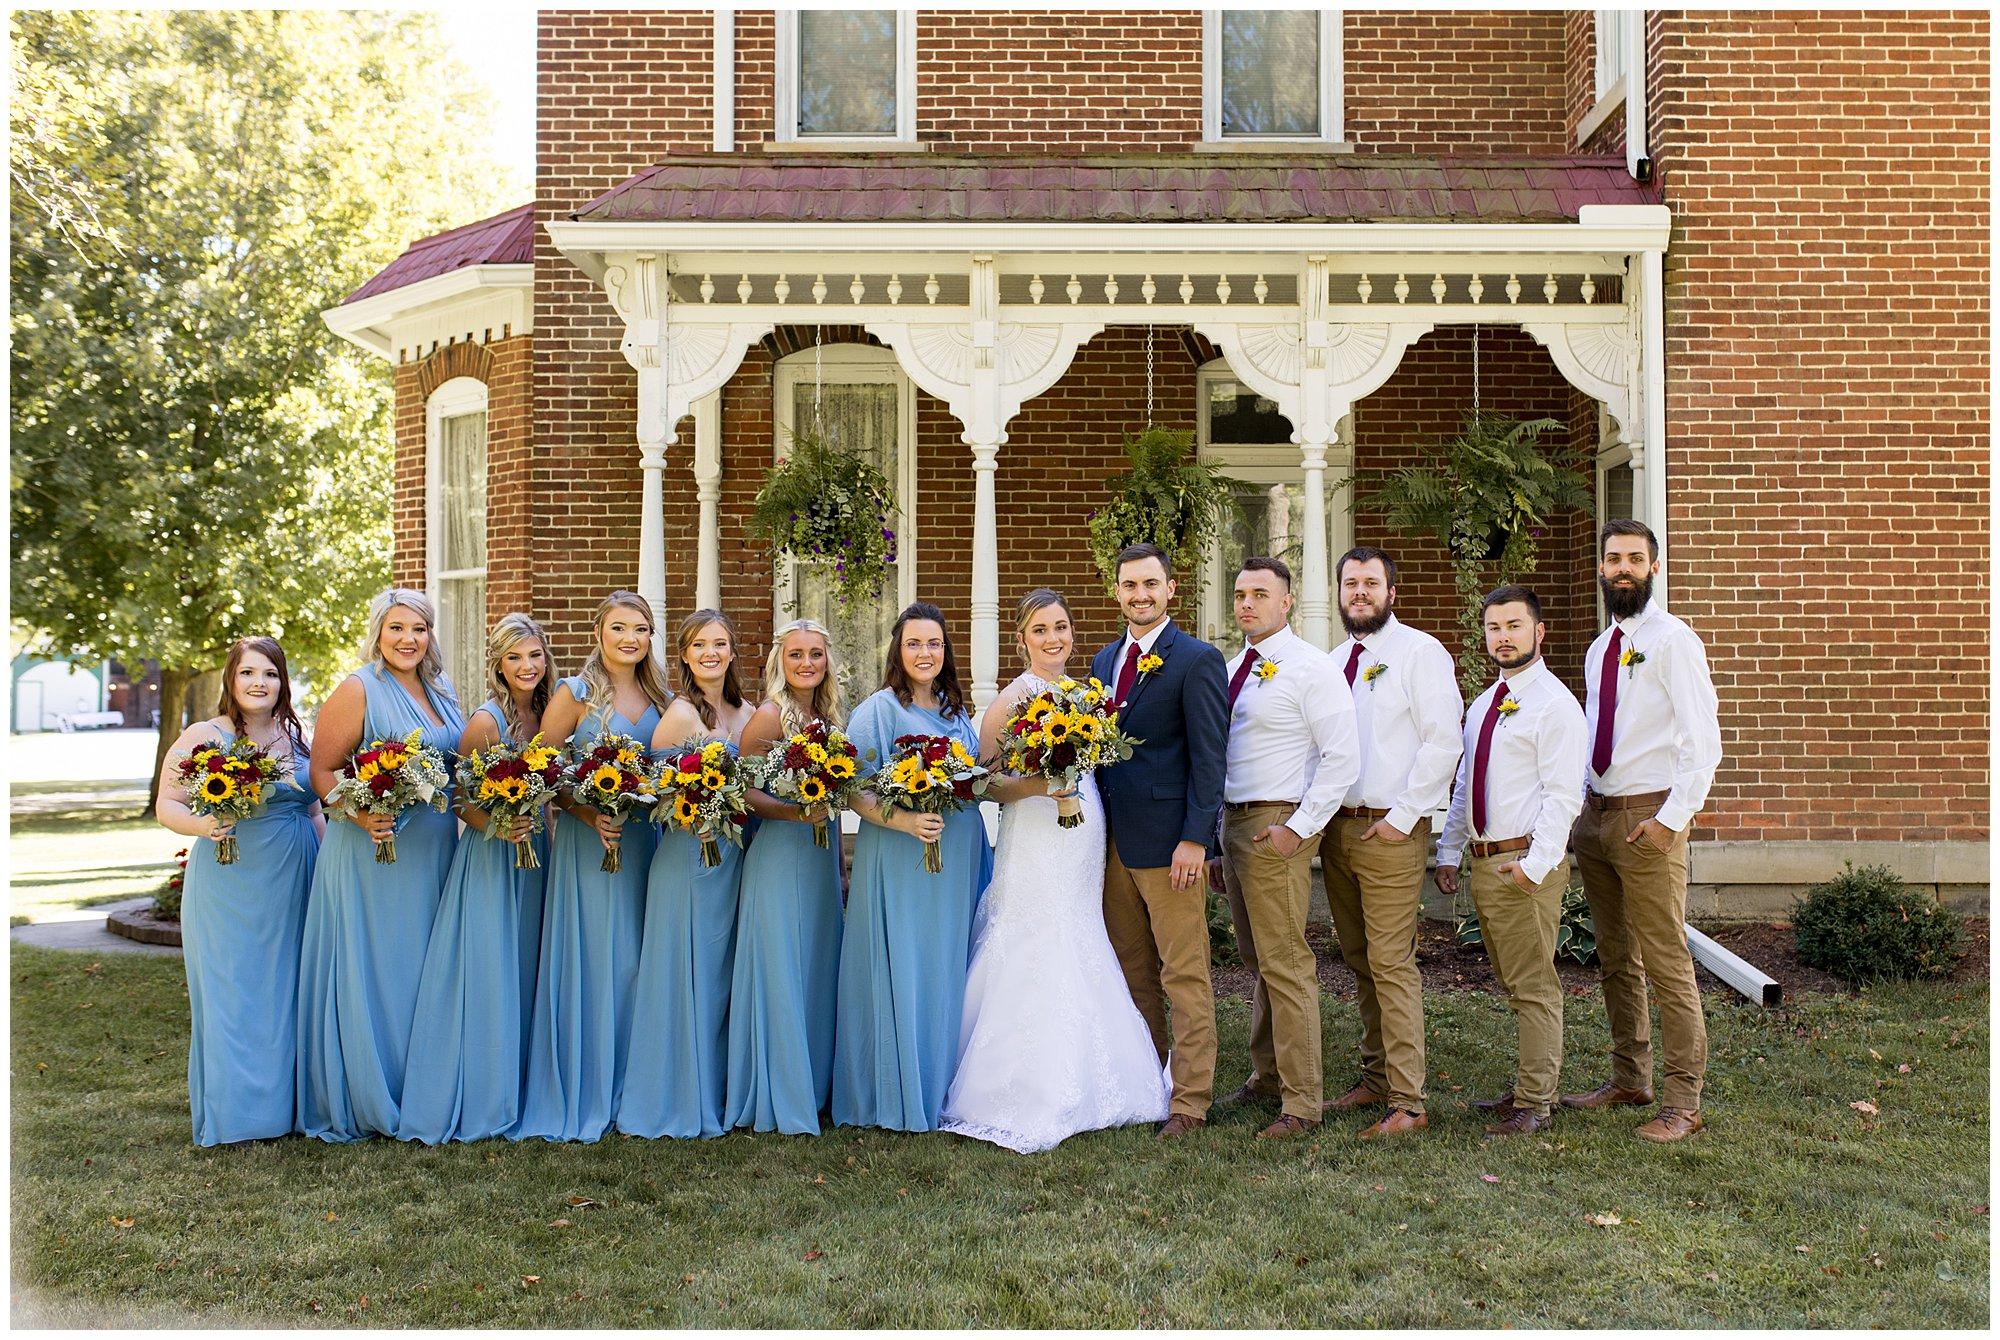 bridal party at Legacy Barn wedding venue in Kokomo Indiana